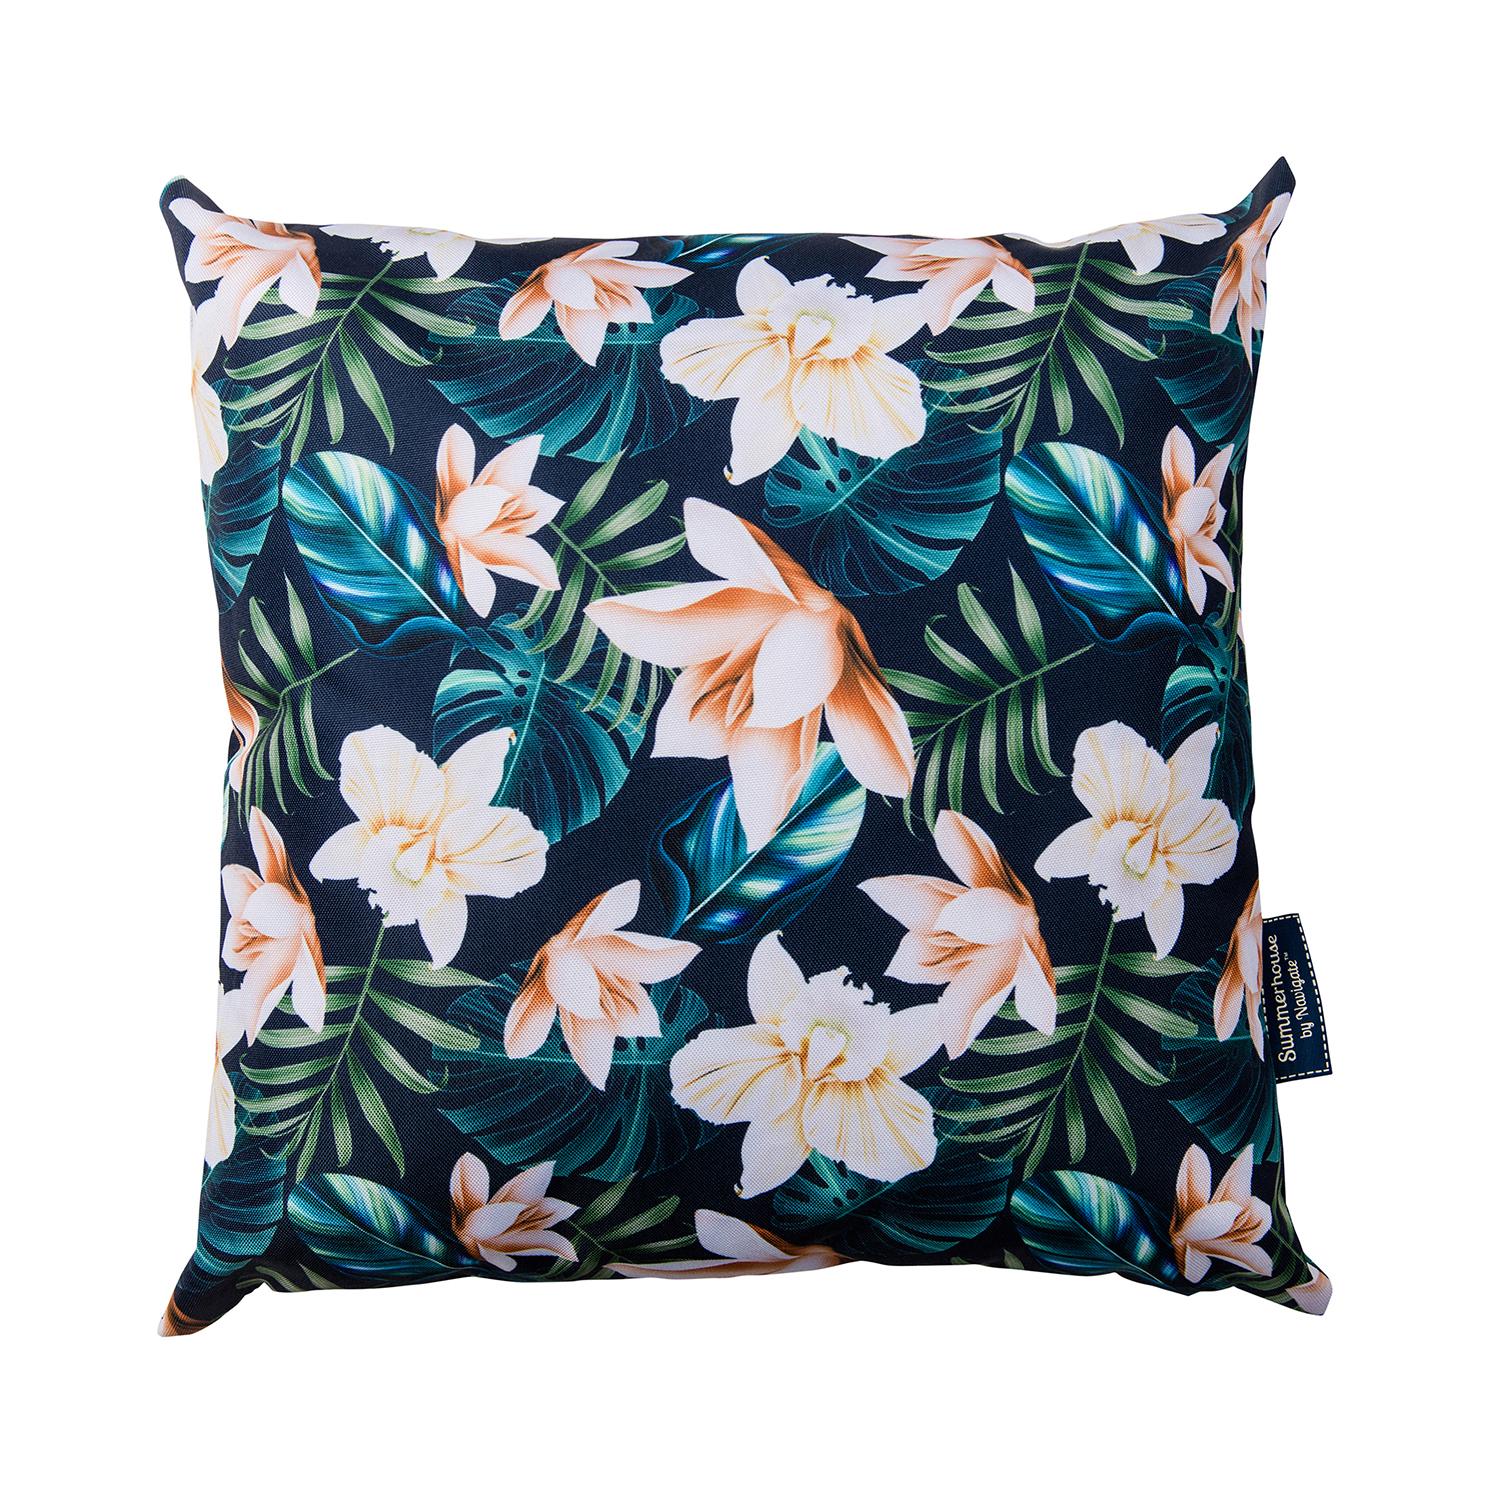 Navigate – Summerhouse 'Java' Outdoor Square Cushion